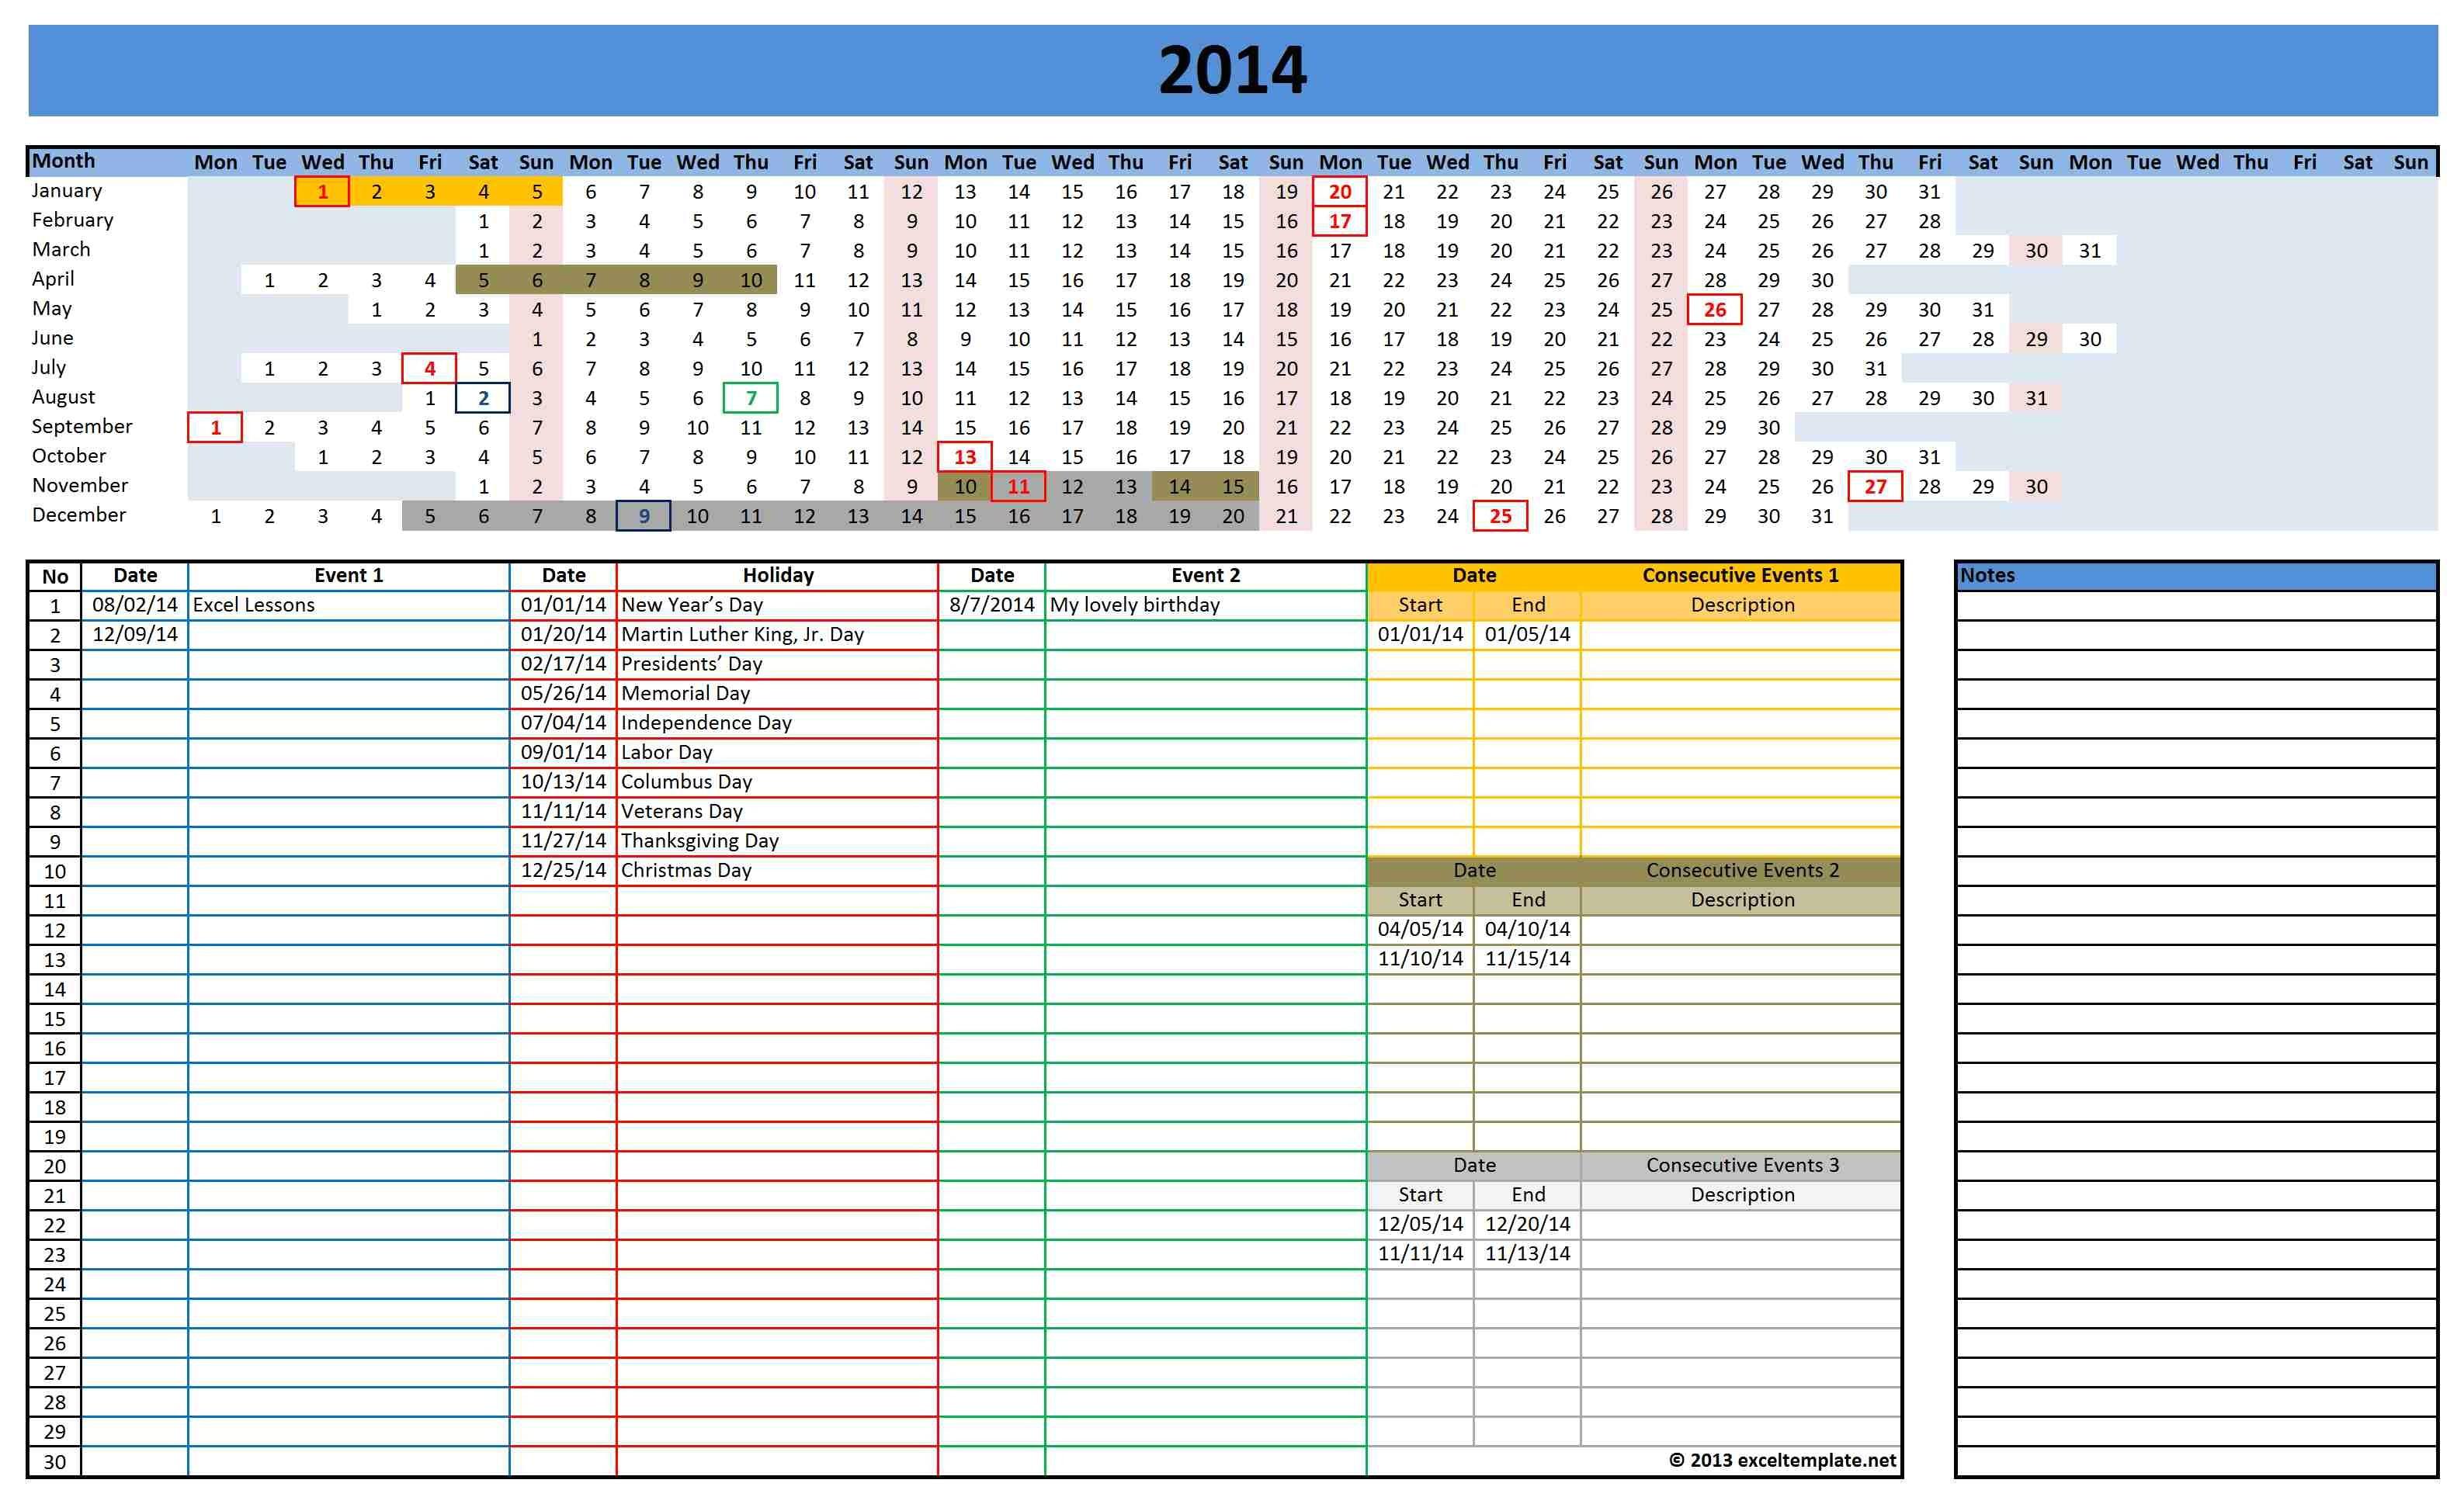 Microsoft Excel Calendar Templates 2014 Microsoft Calendar Template 2014 Madinbelgrade